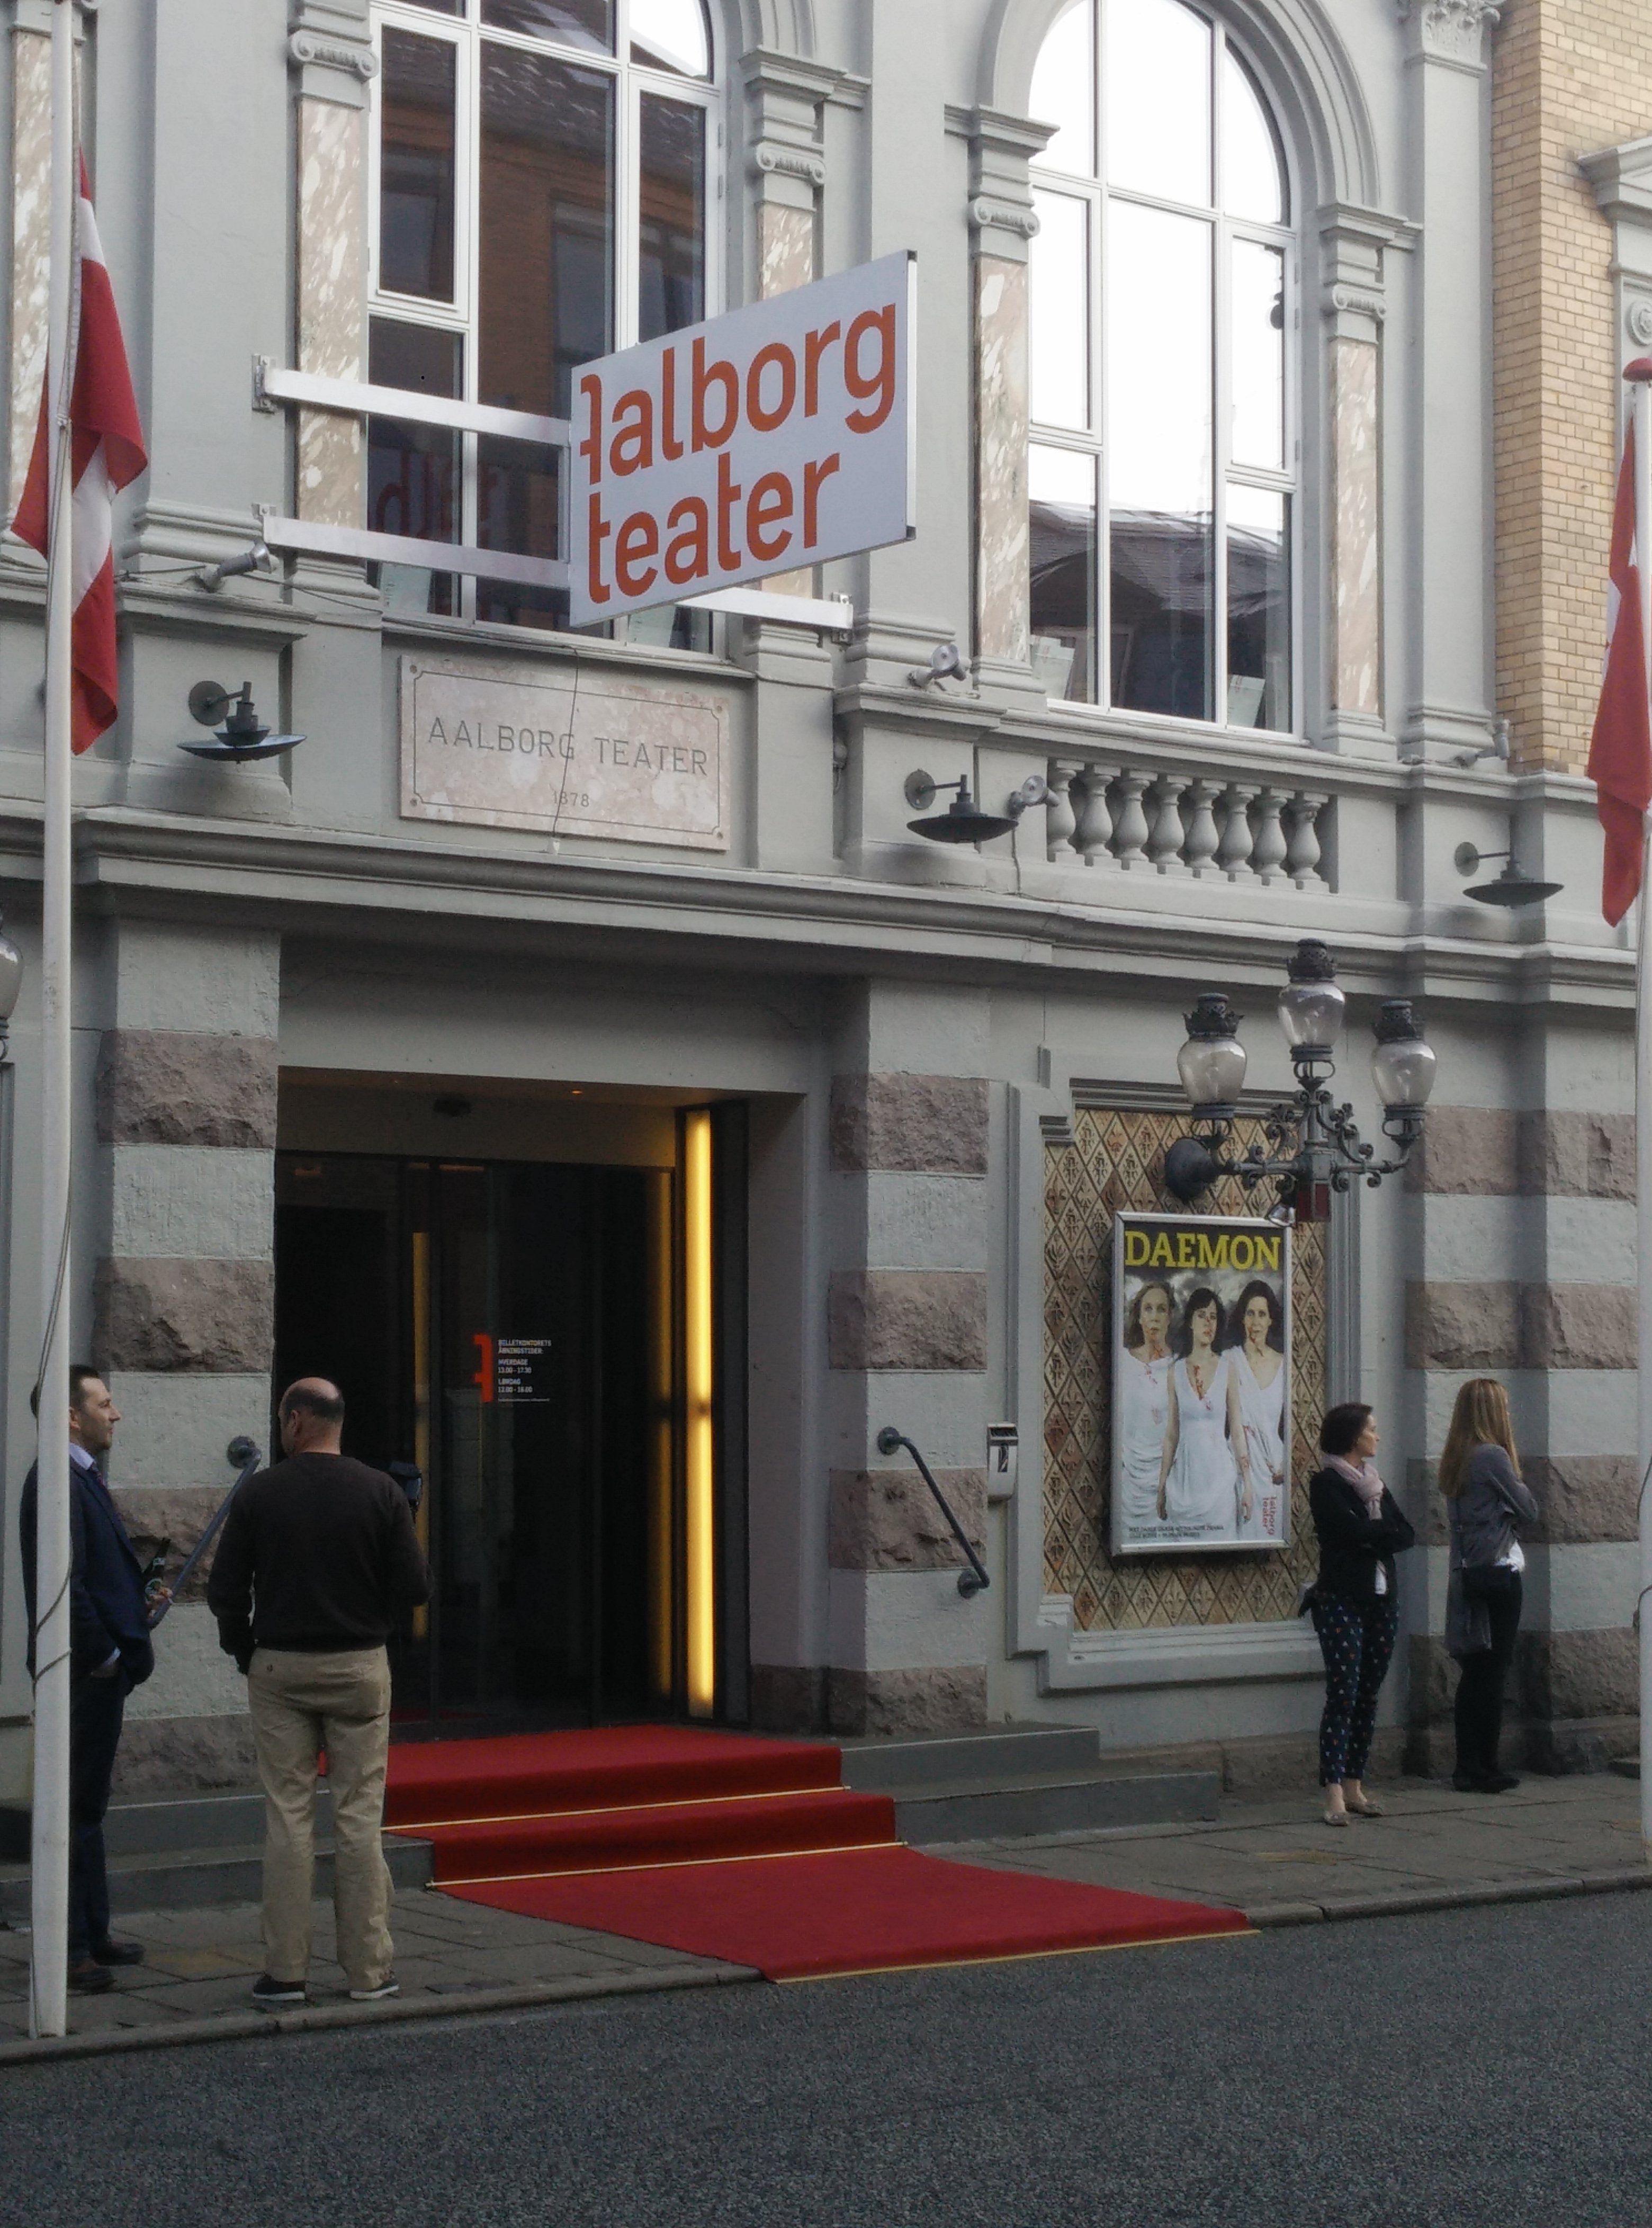 Teaterblik: Ungt Teaterblod fylder 1 år!